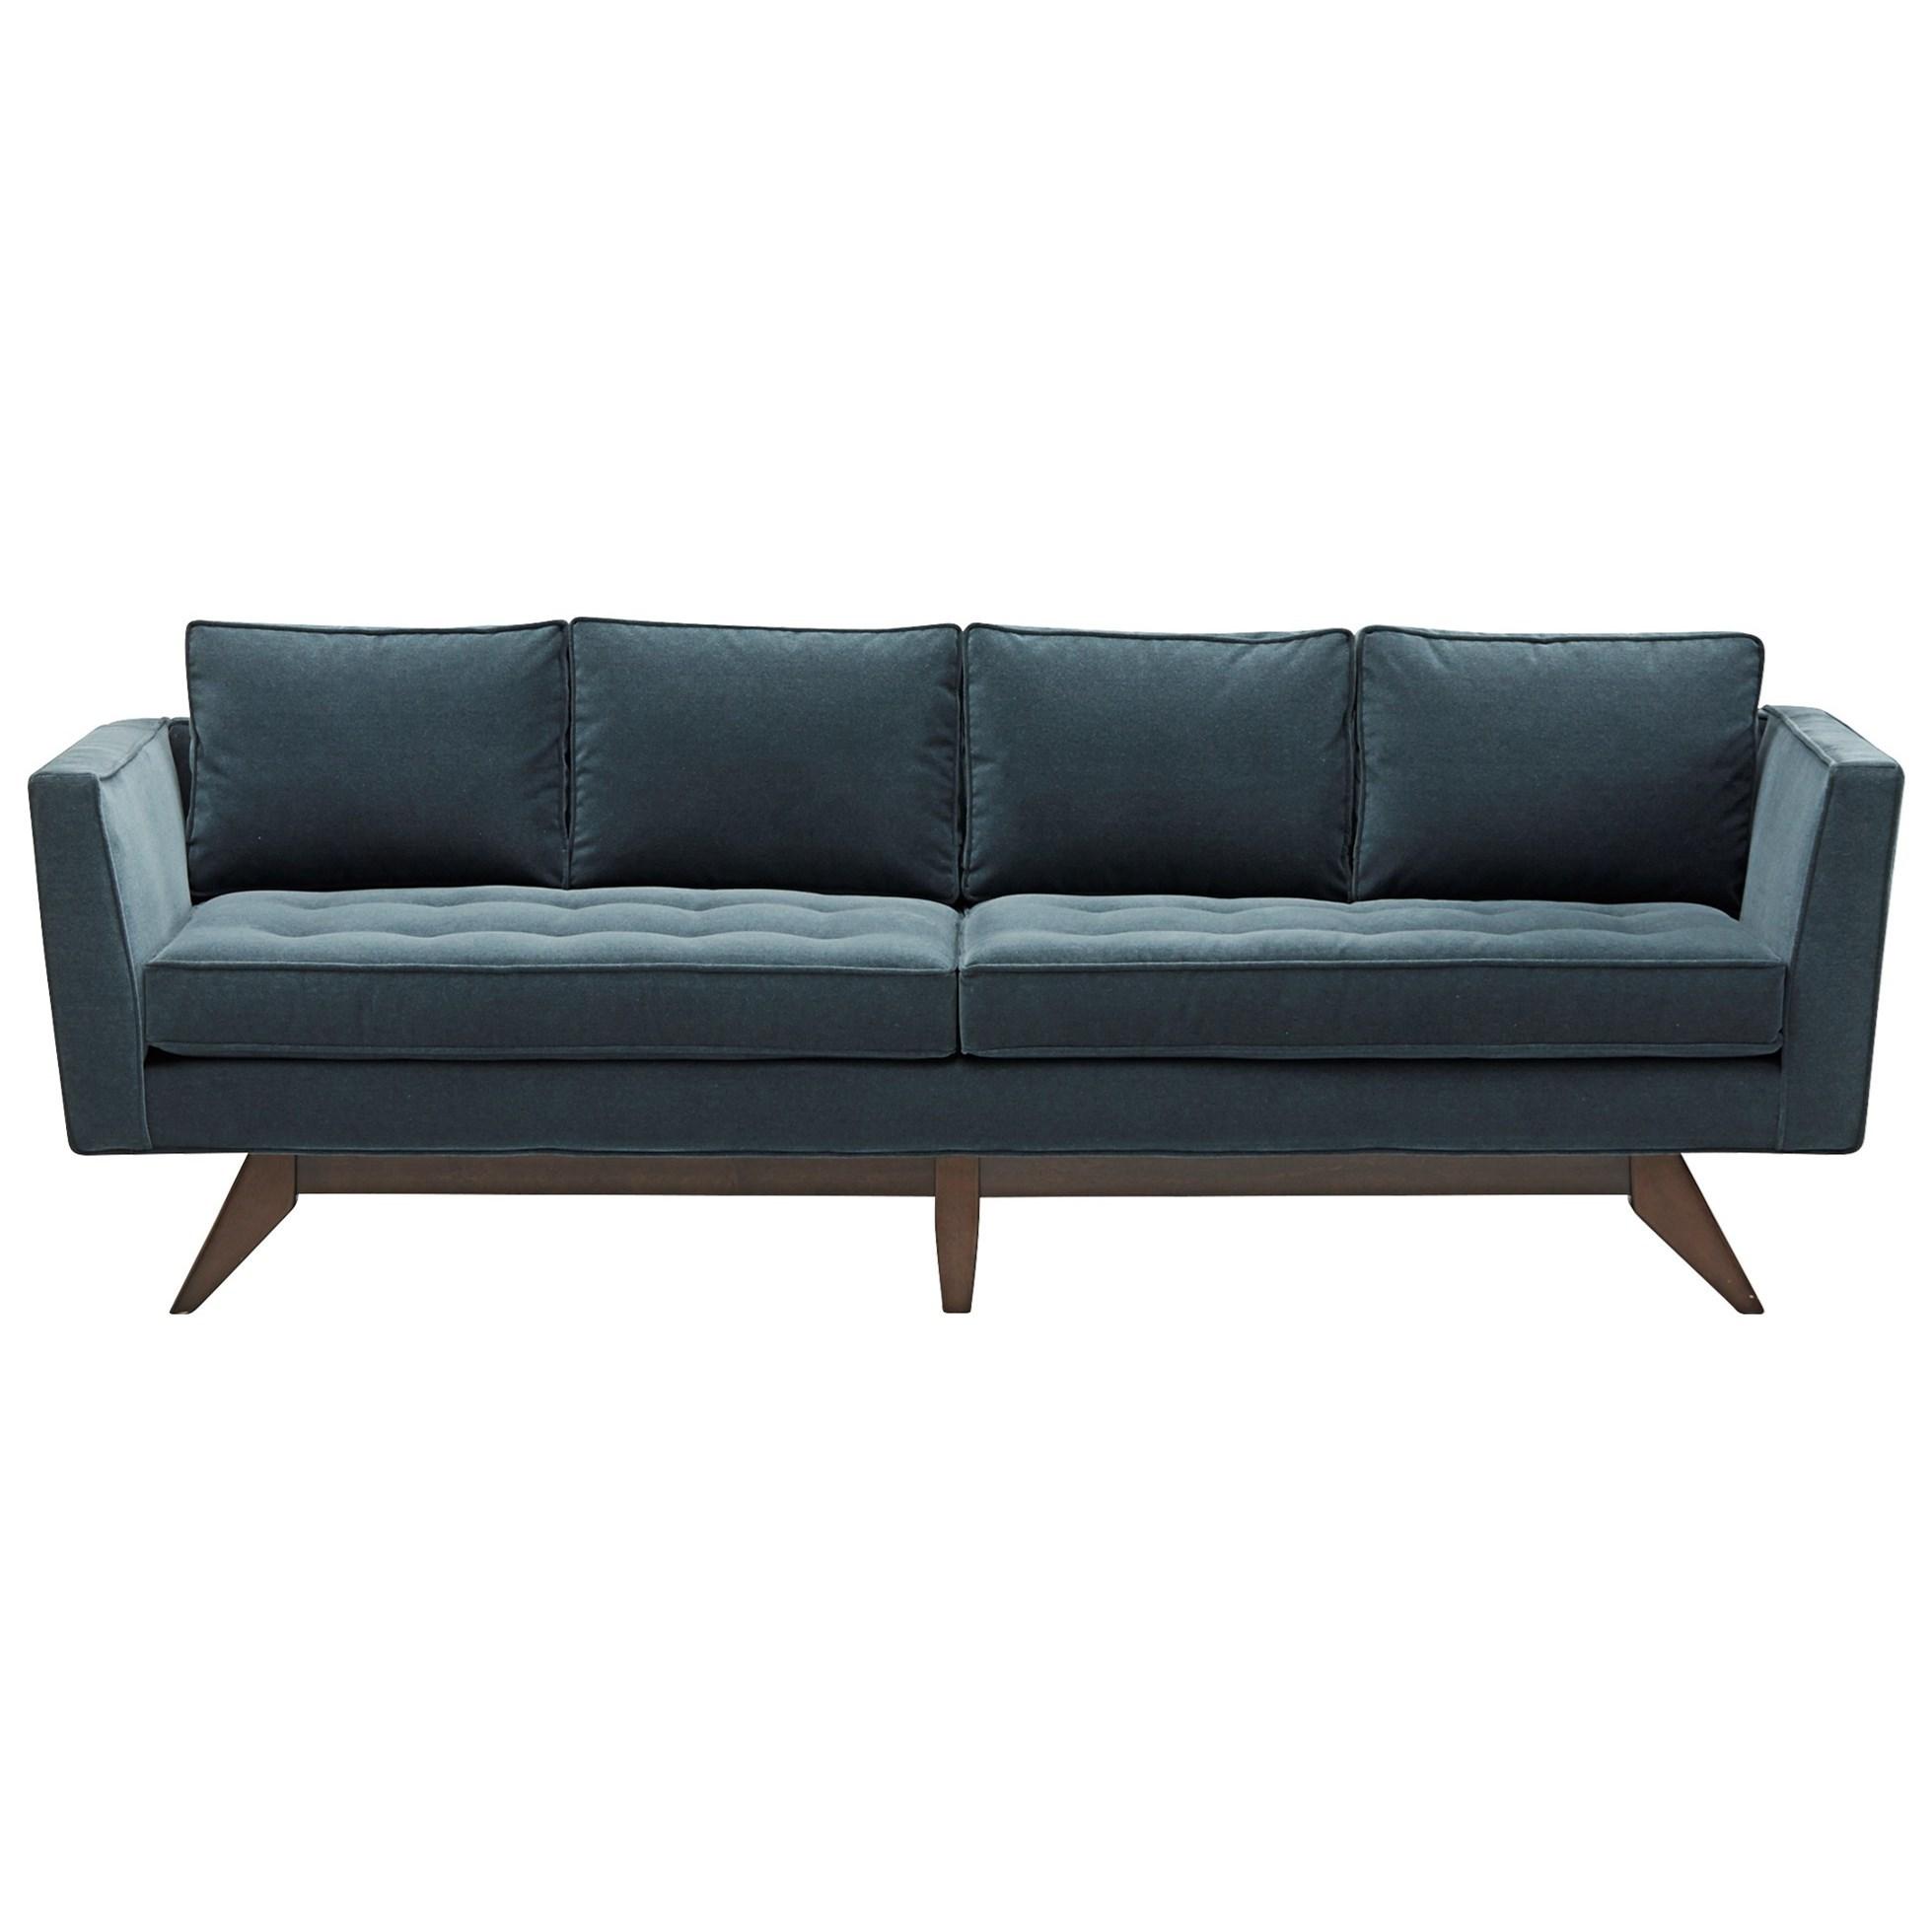 Fairfax Sofa by Klaussner at Lapeer Furniture & Mattress Center